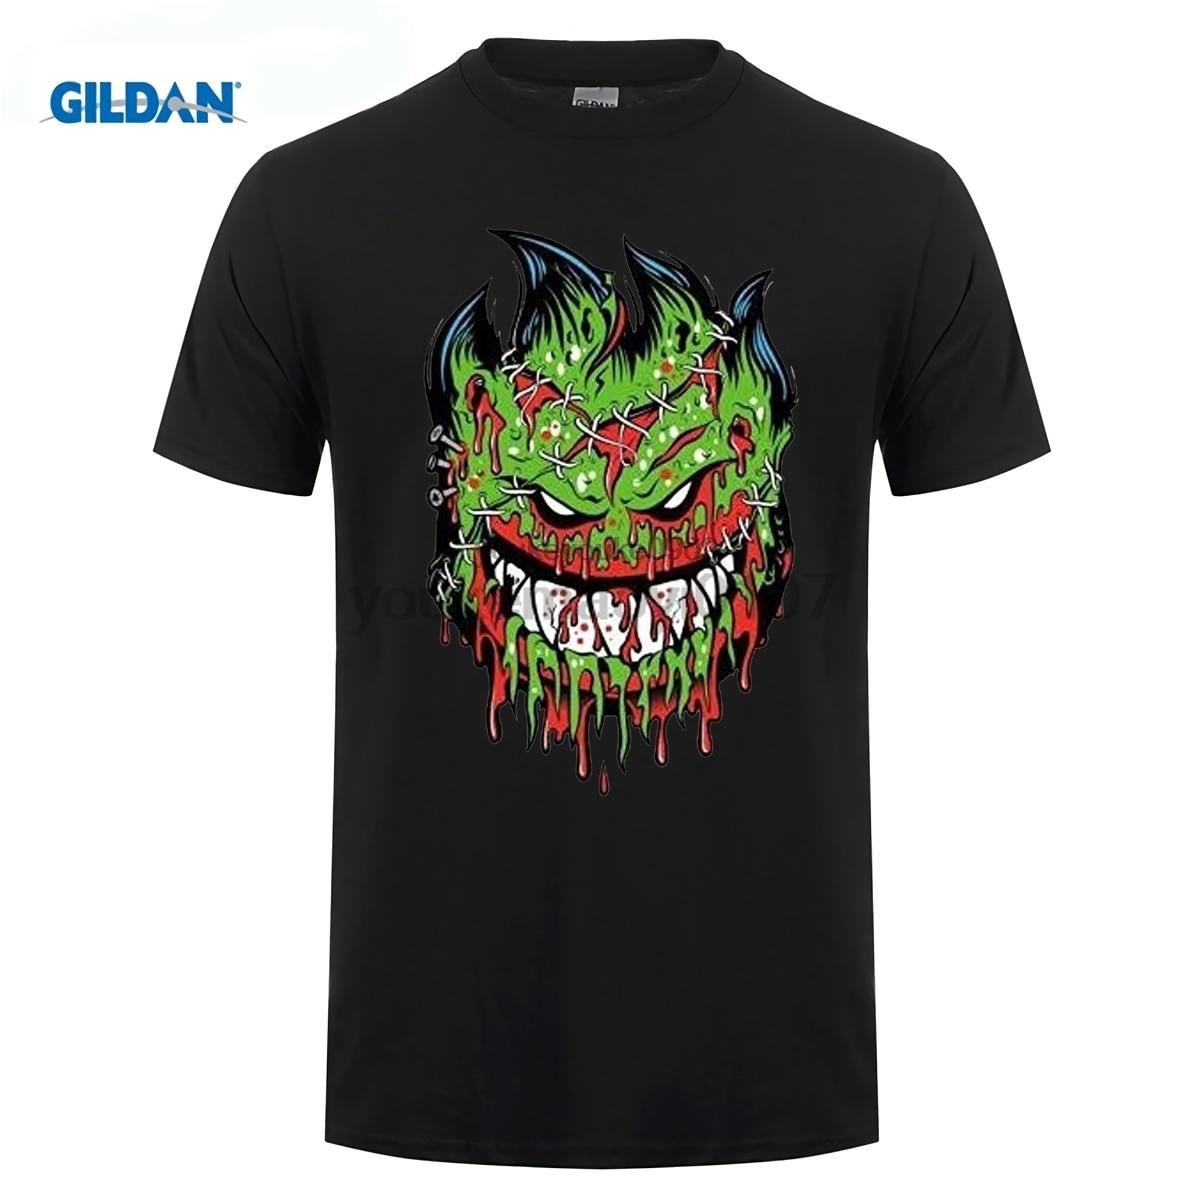 GILDAN T Shirt Fashion Gildan O-Neck Men Short Sleeve Fashion Spitfire Skate Terrible T-Shirts